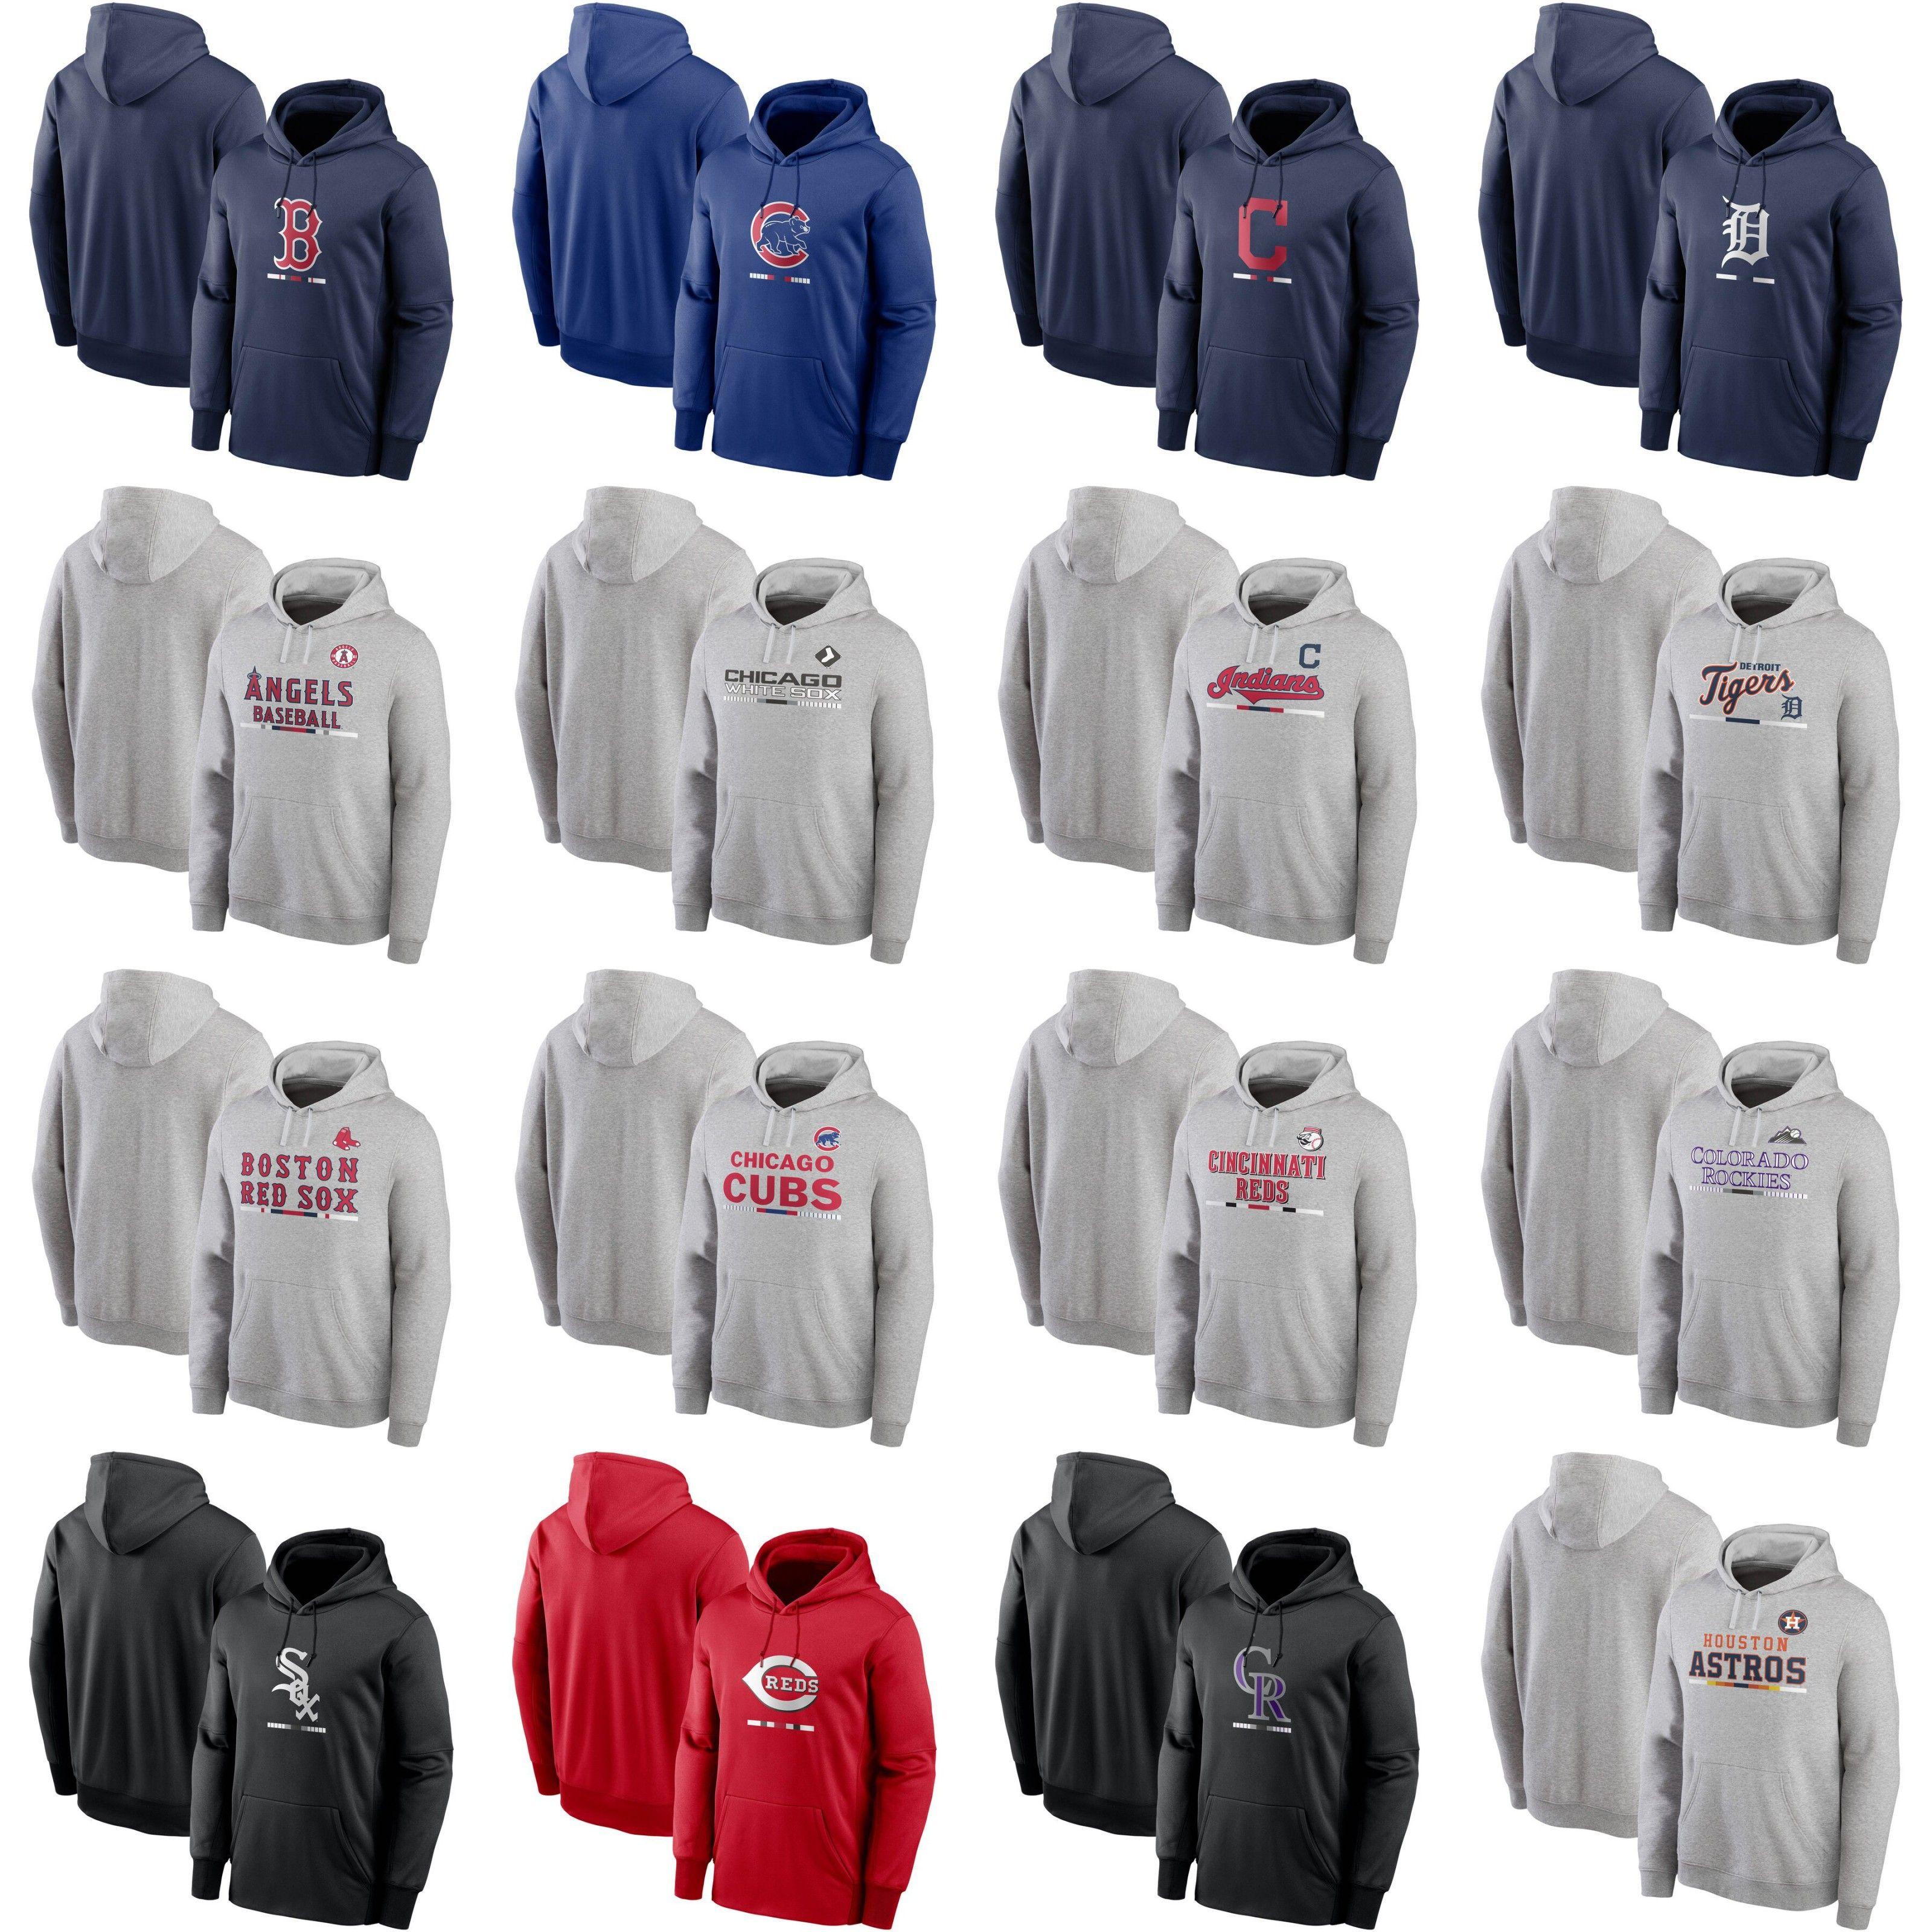 2020 New Season Legacy Performance Pullover Hoodie Long Sleeve Sweatshirts Mens Womens Youth Baseball Jerseys Free Shipping